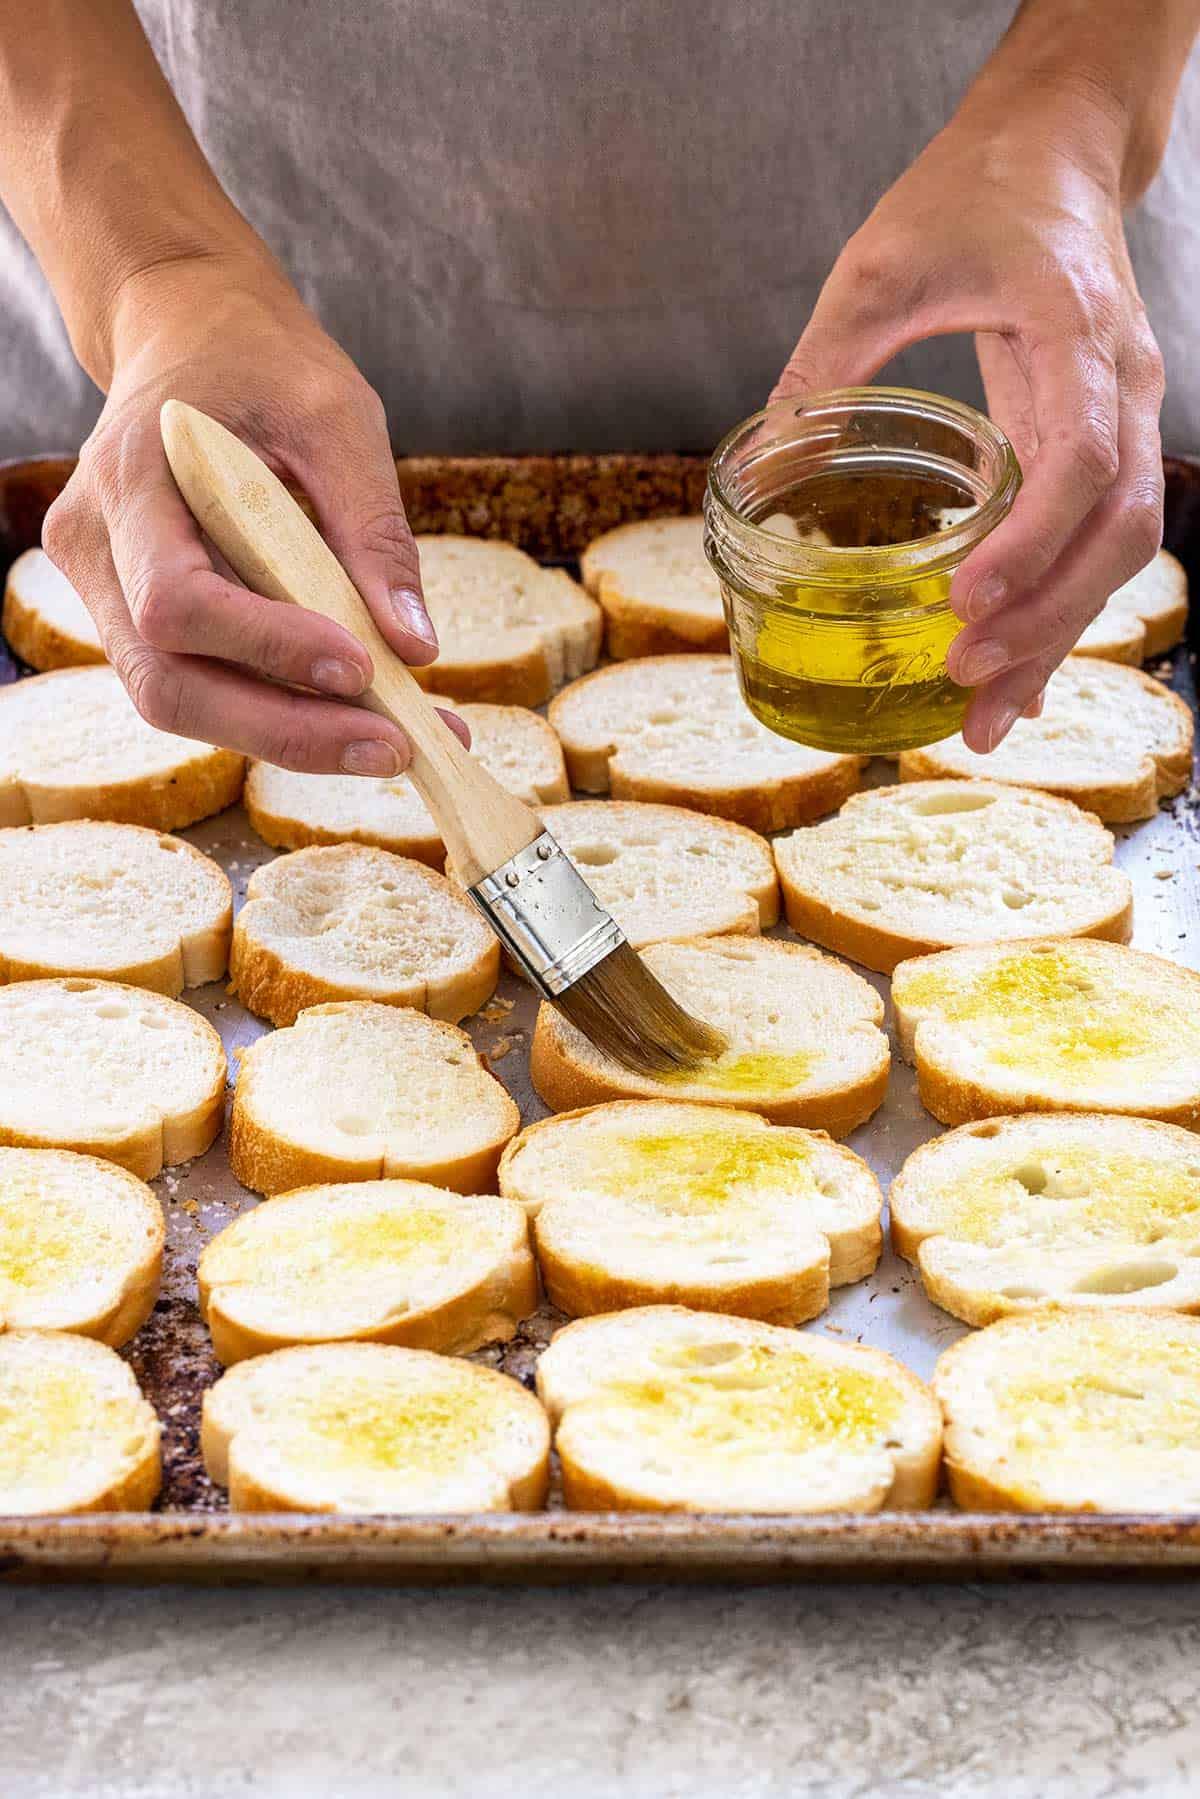 brushing oil on bread slices